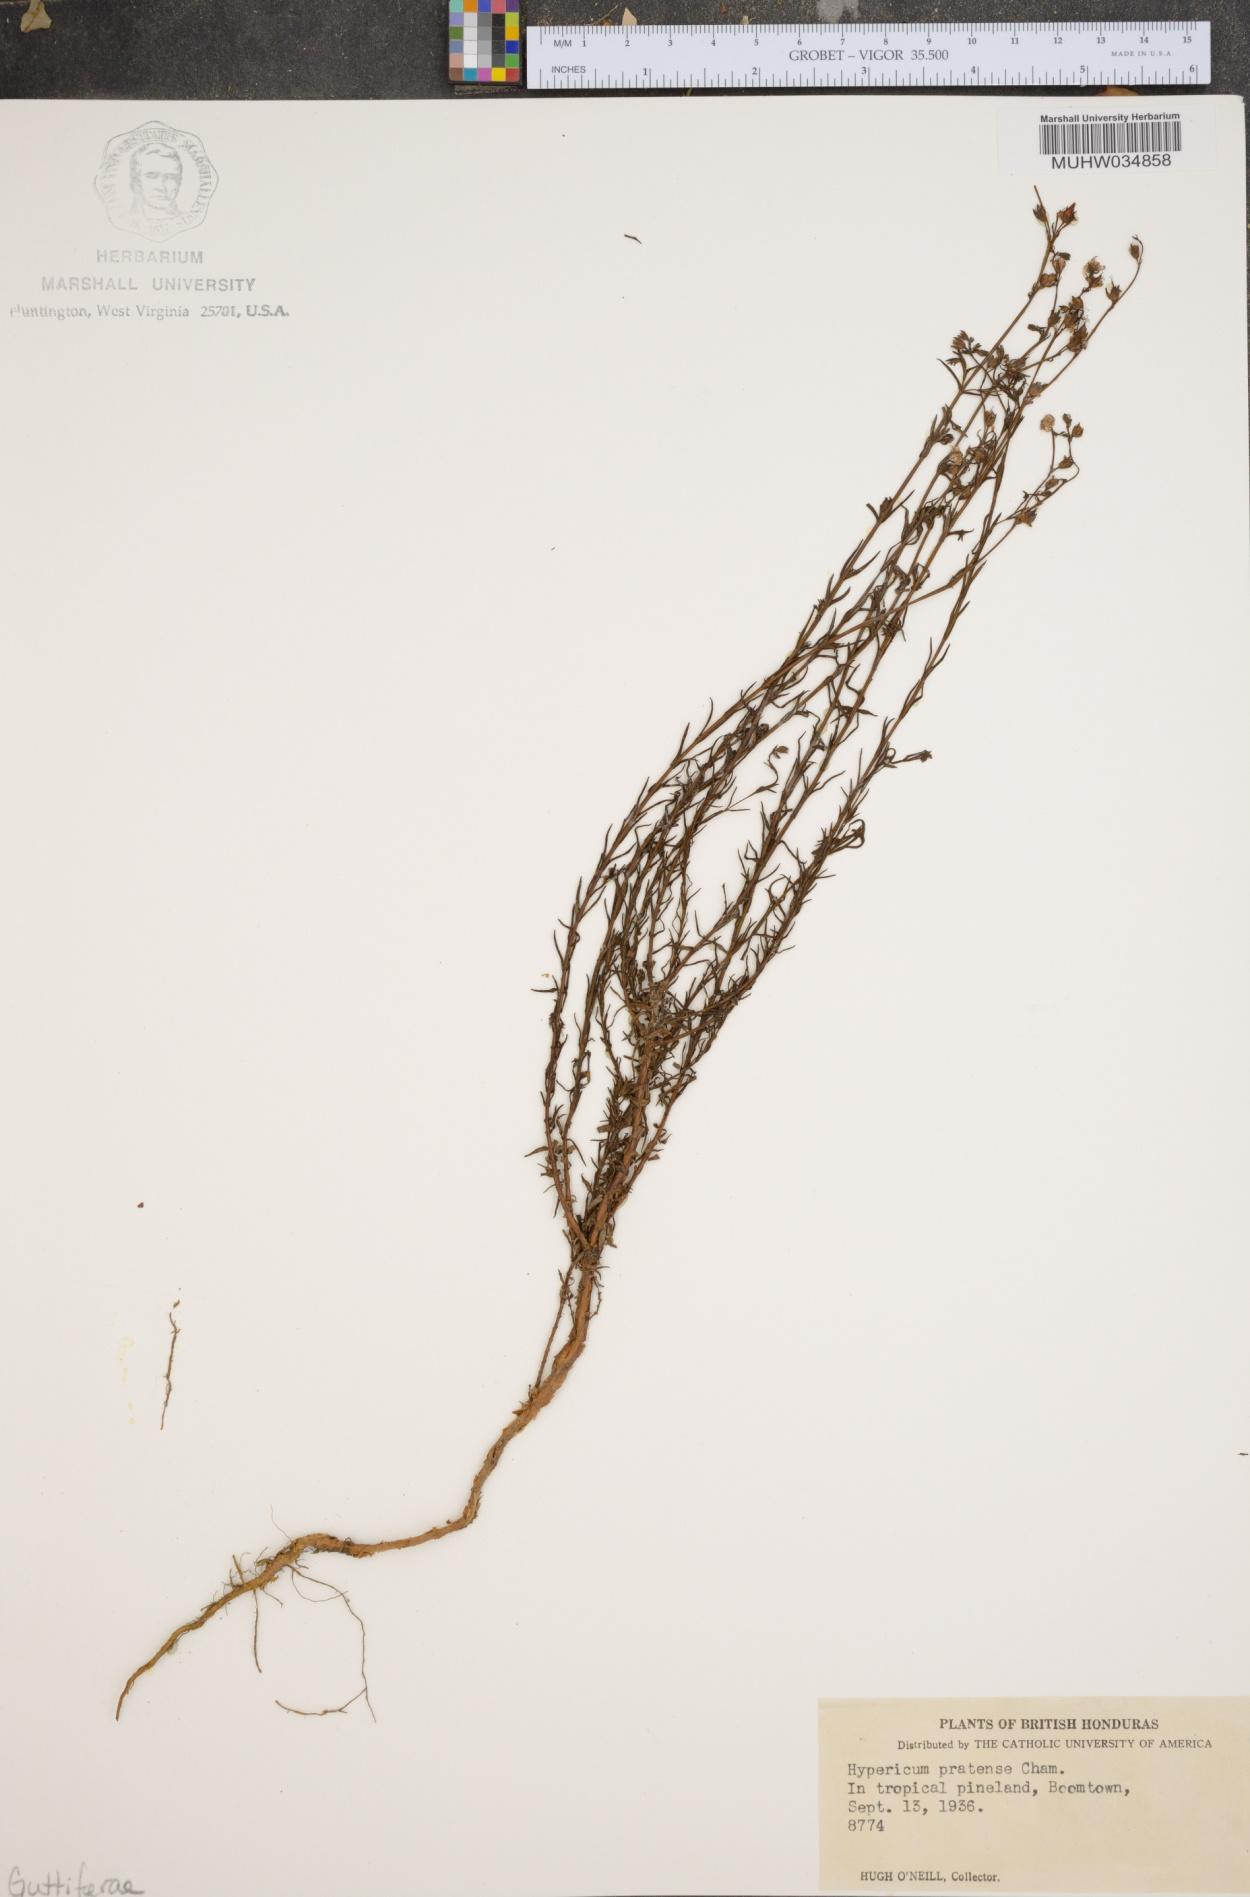 Hypericum pratense image